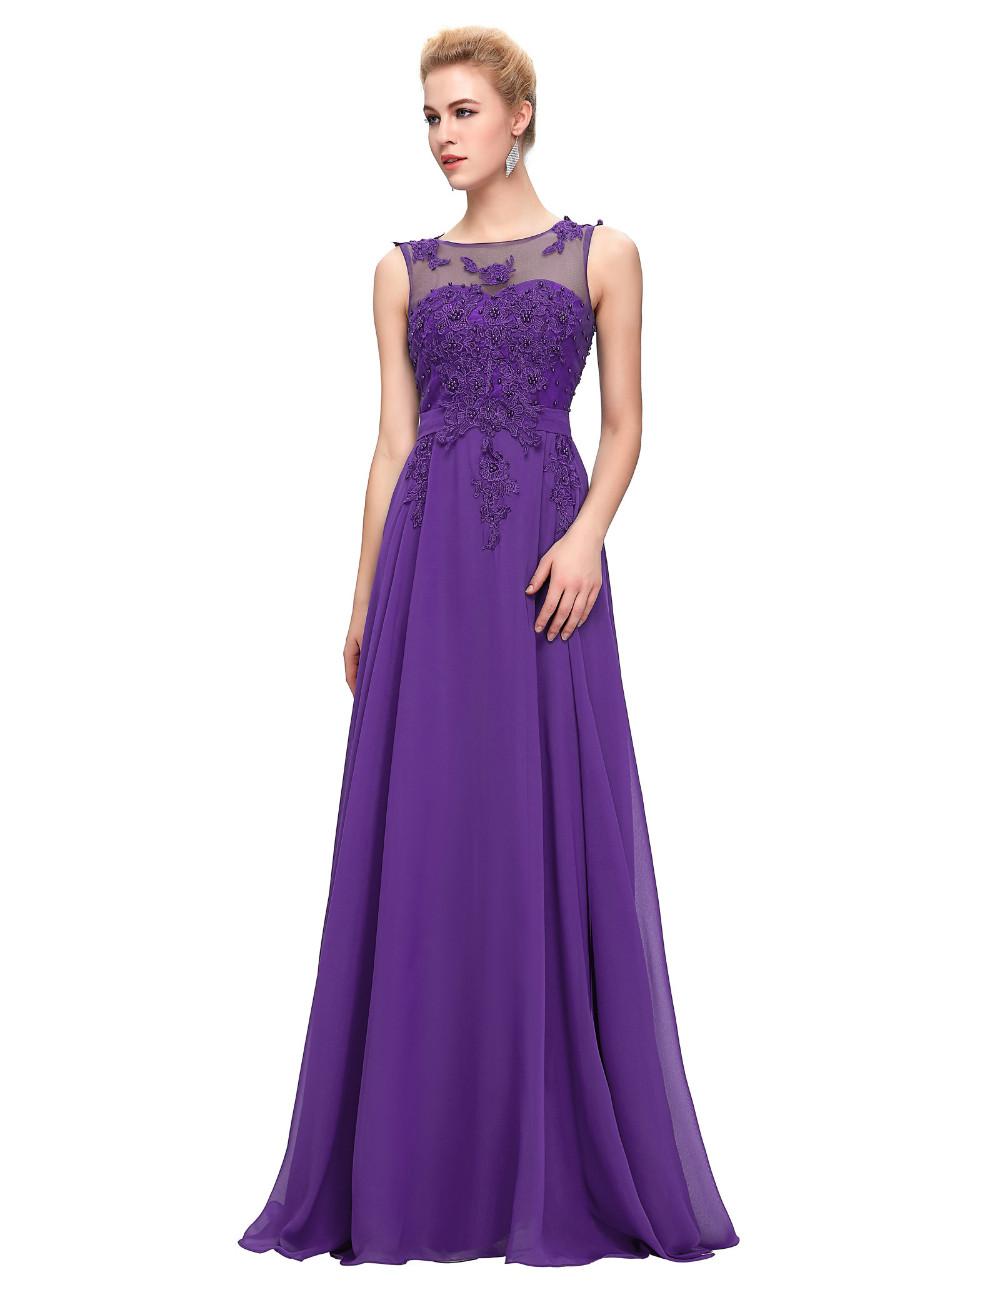 Grace Karin Elegant Long Evening Dresses 2016 Chiffon Pink Purple Red Royal Blue Black Formal Evening Dress Gown Abendkleider 30